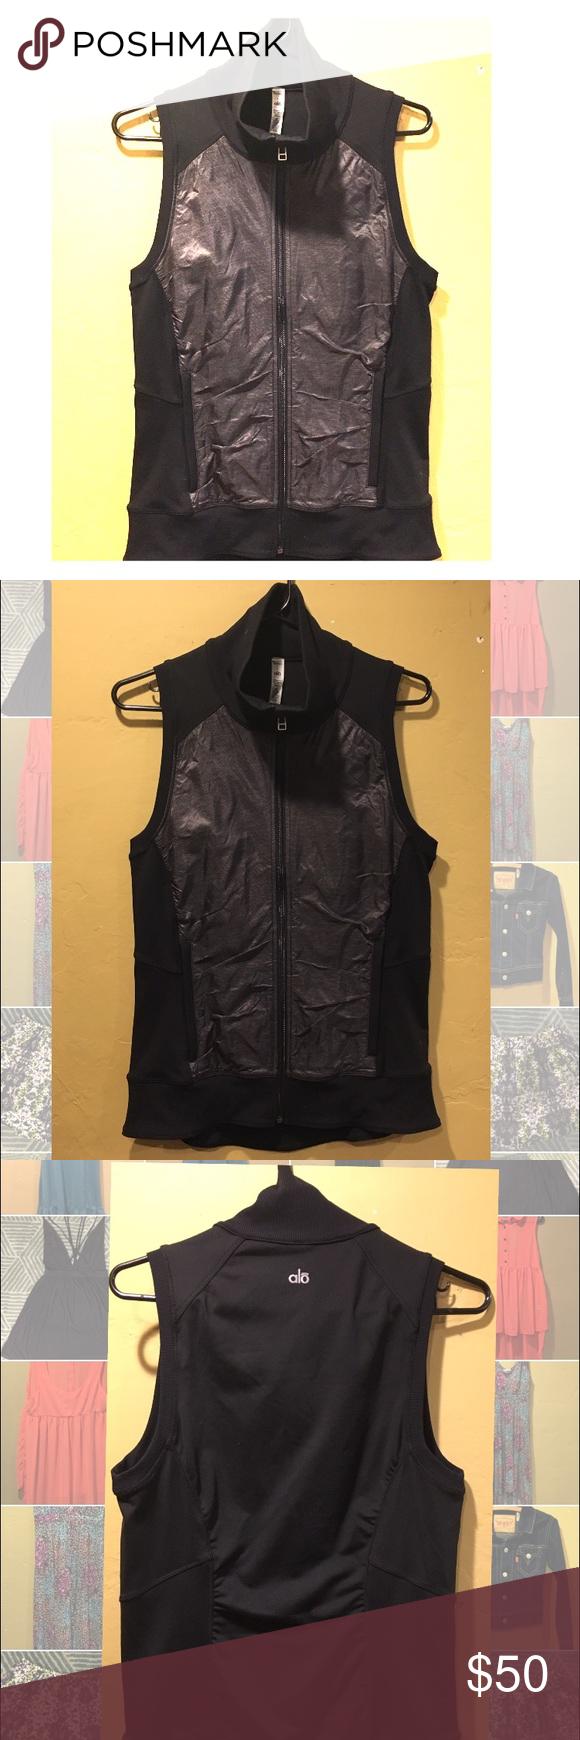 Alo Yoga Lakeside Vest Black NWOT Size L black Alo Yoga Lakeside vest. Very flattering. NWOT. ALO Yoga Jackets & Coats Vests